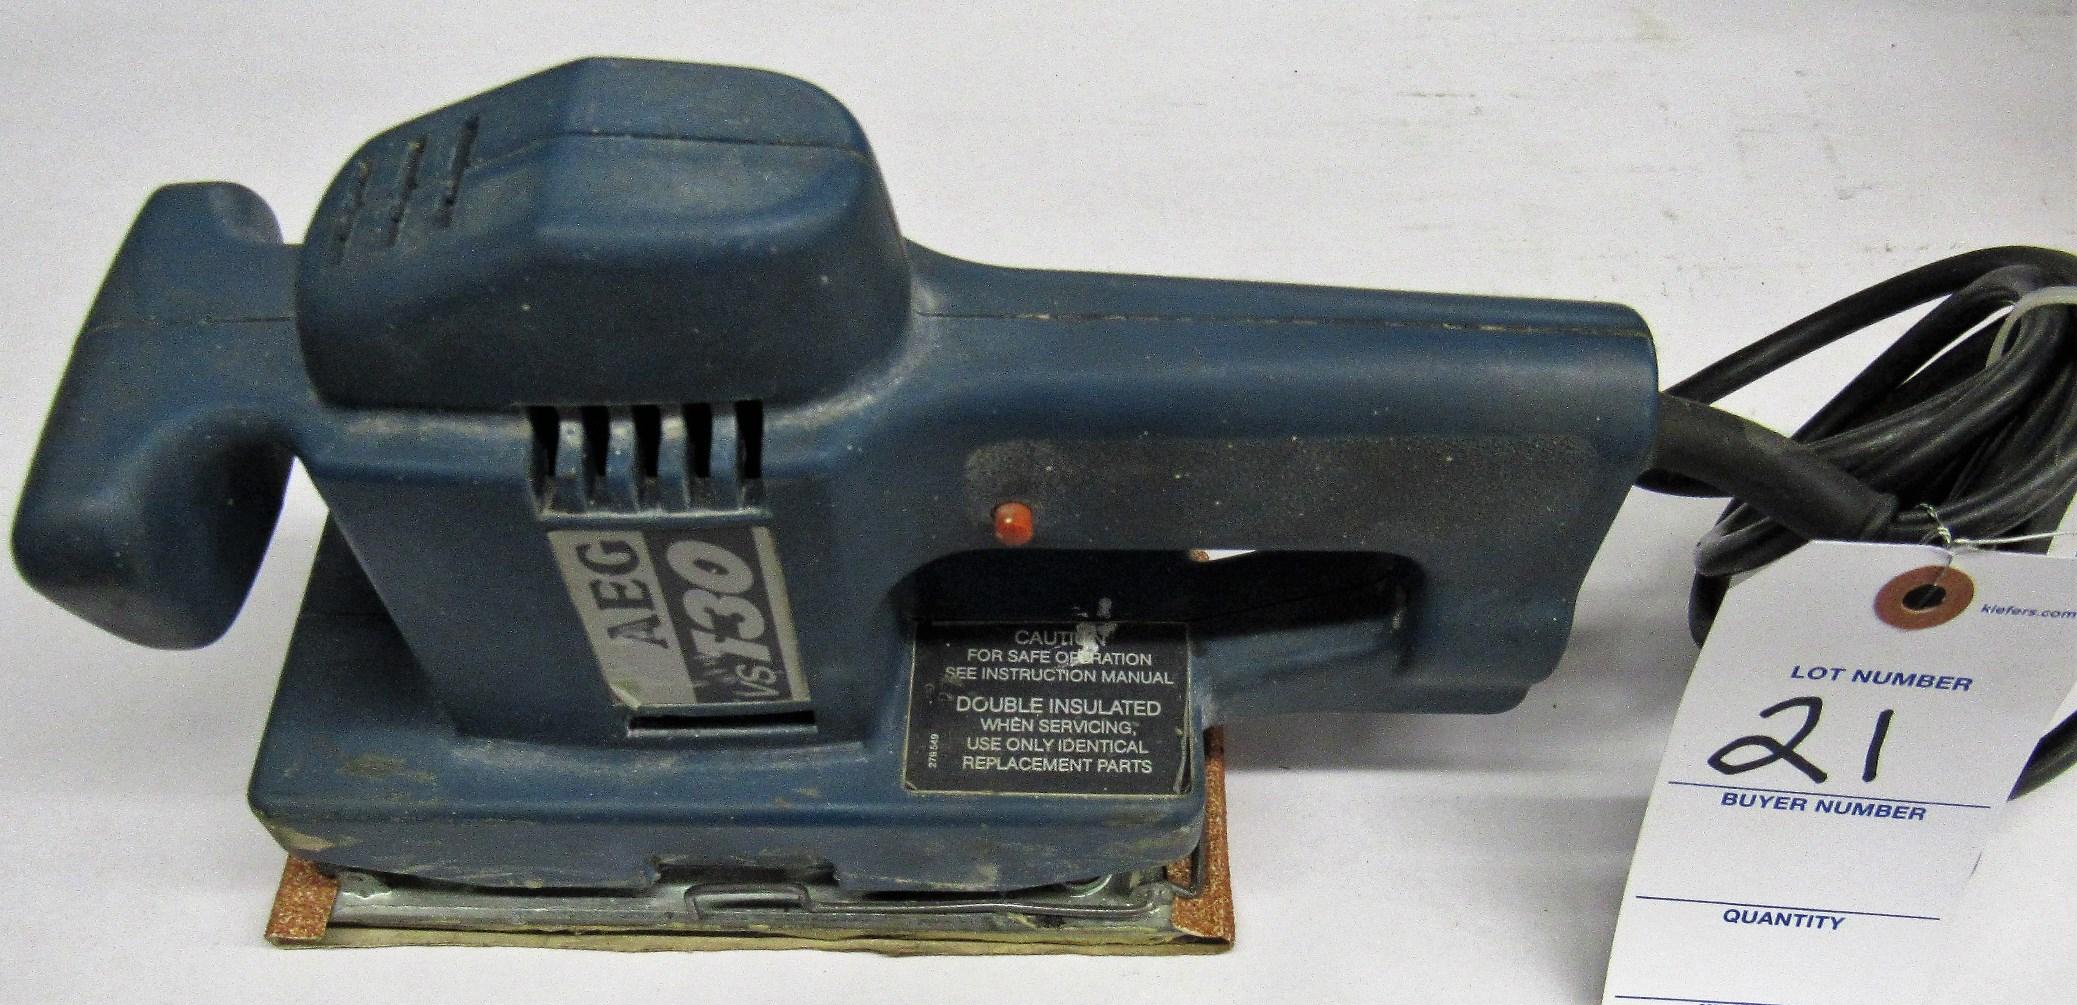 Lot 21 - AEG Mod.VS130 Oribital Sander